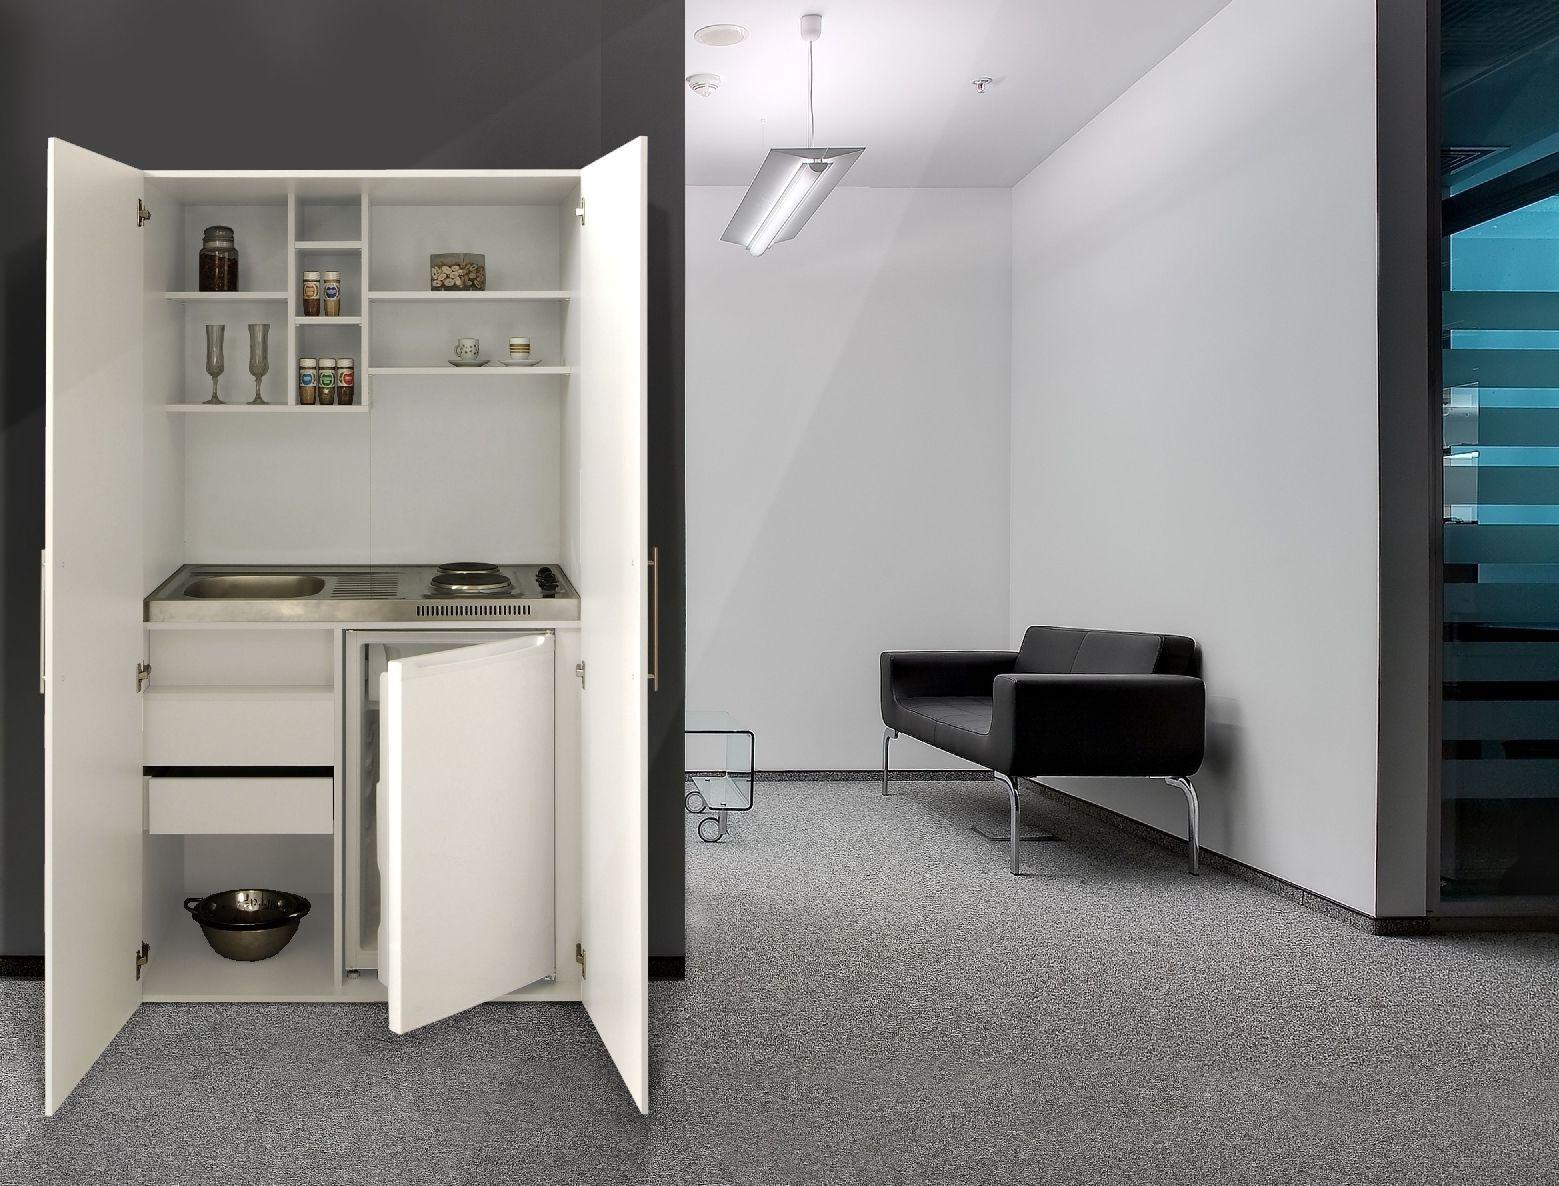 Full Size of Büroküche Sauber Halten Büroküche Inwerk Büro Küche Ohne Spüle In Der Büroküche Gibts Kuchen Küche Büroküche